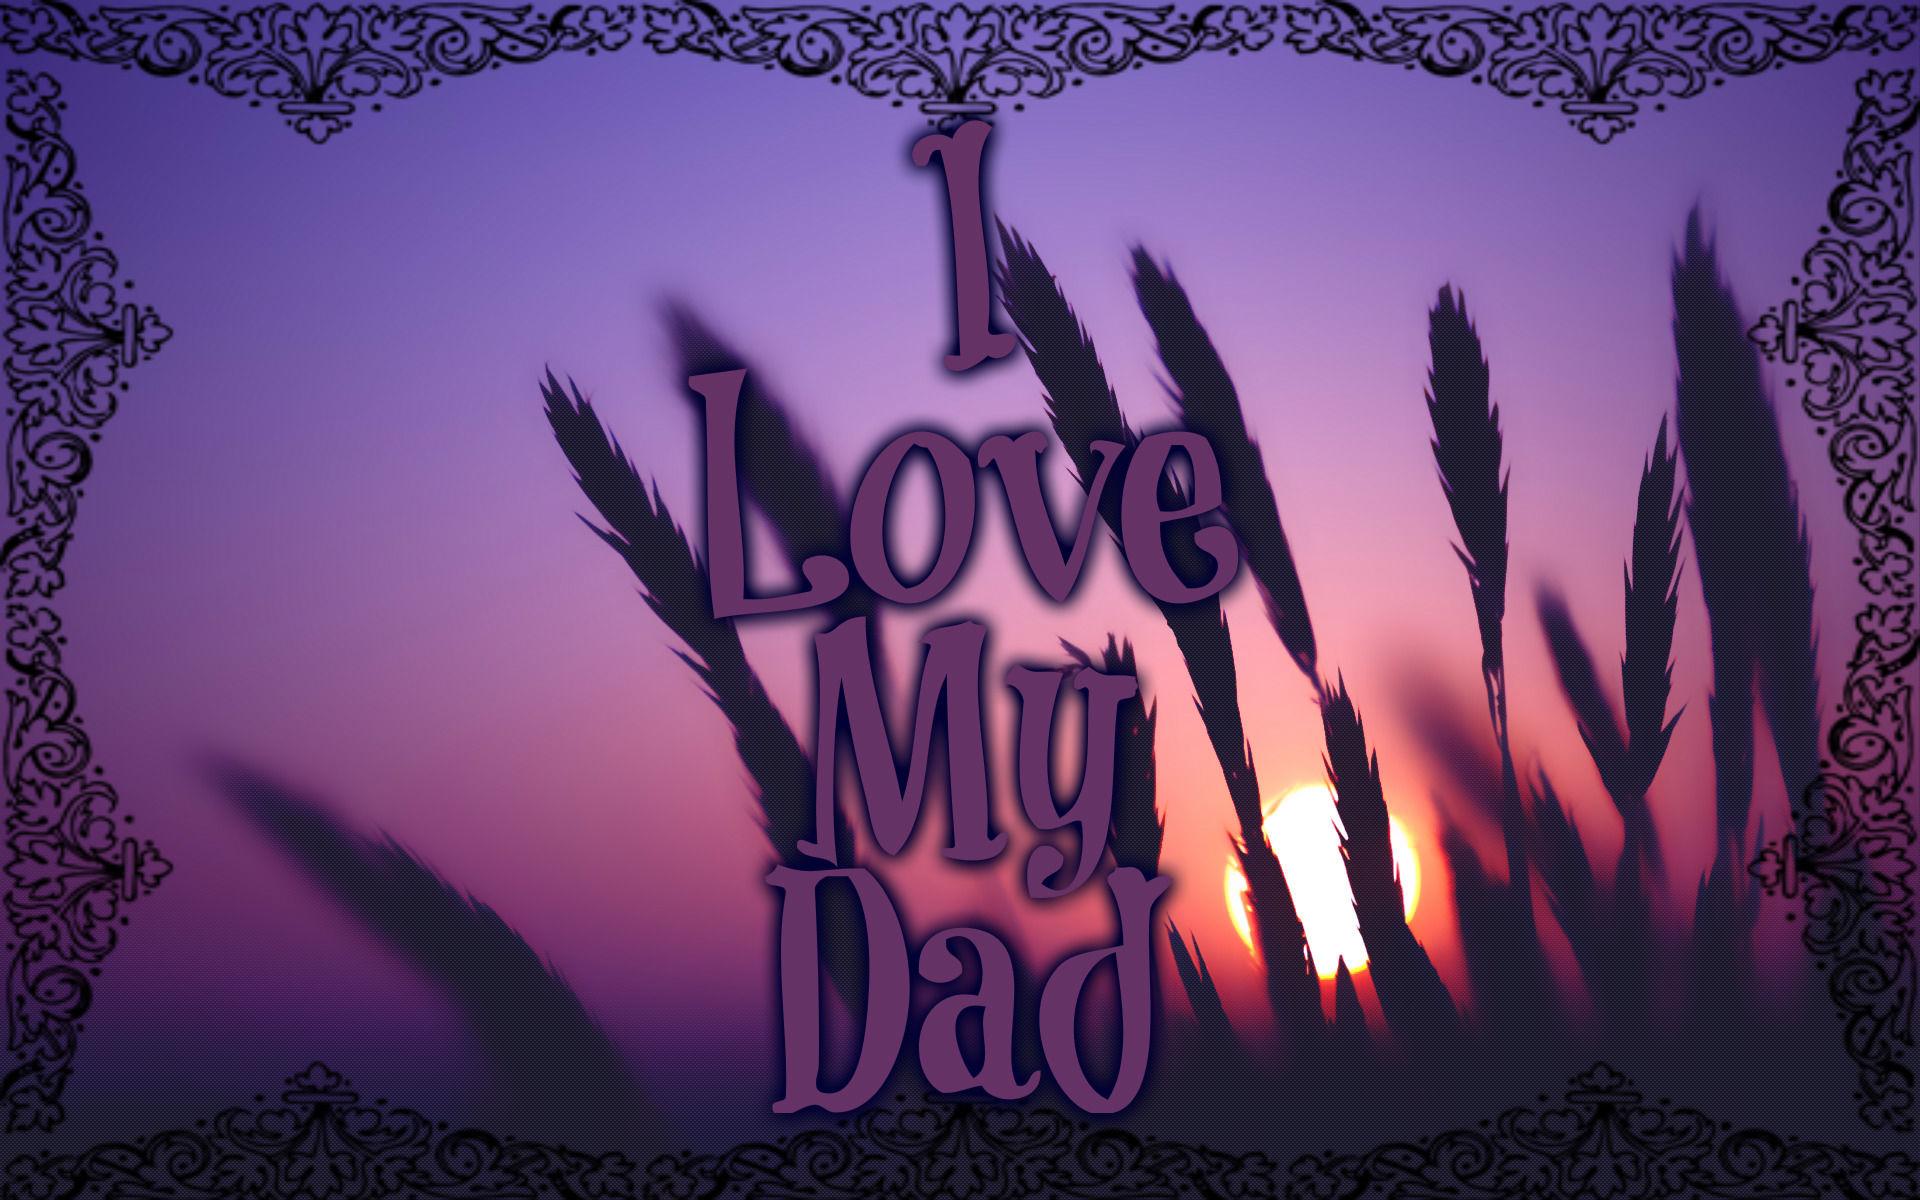 I Love My Dad   Cute Desktop Wallpaper Hd   1920x1200 Wallpaper 1920x1200